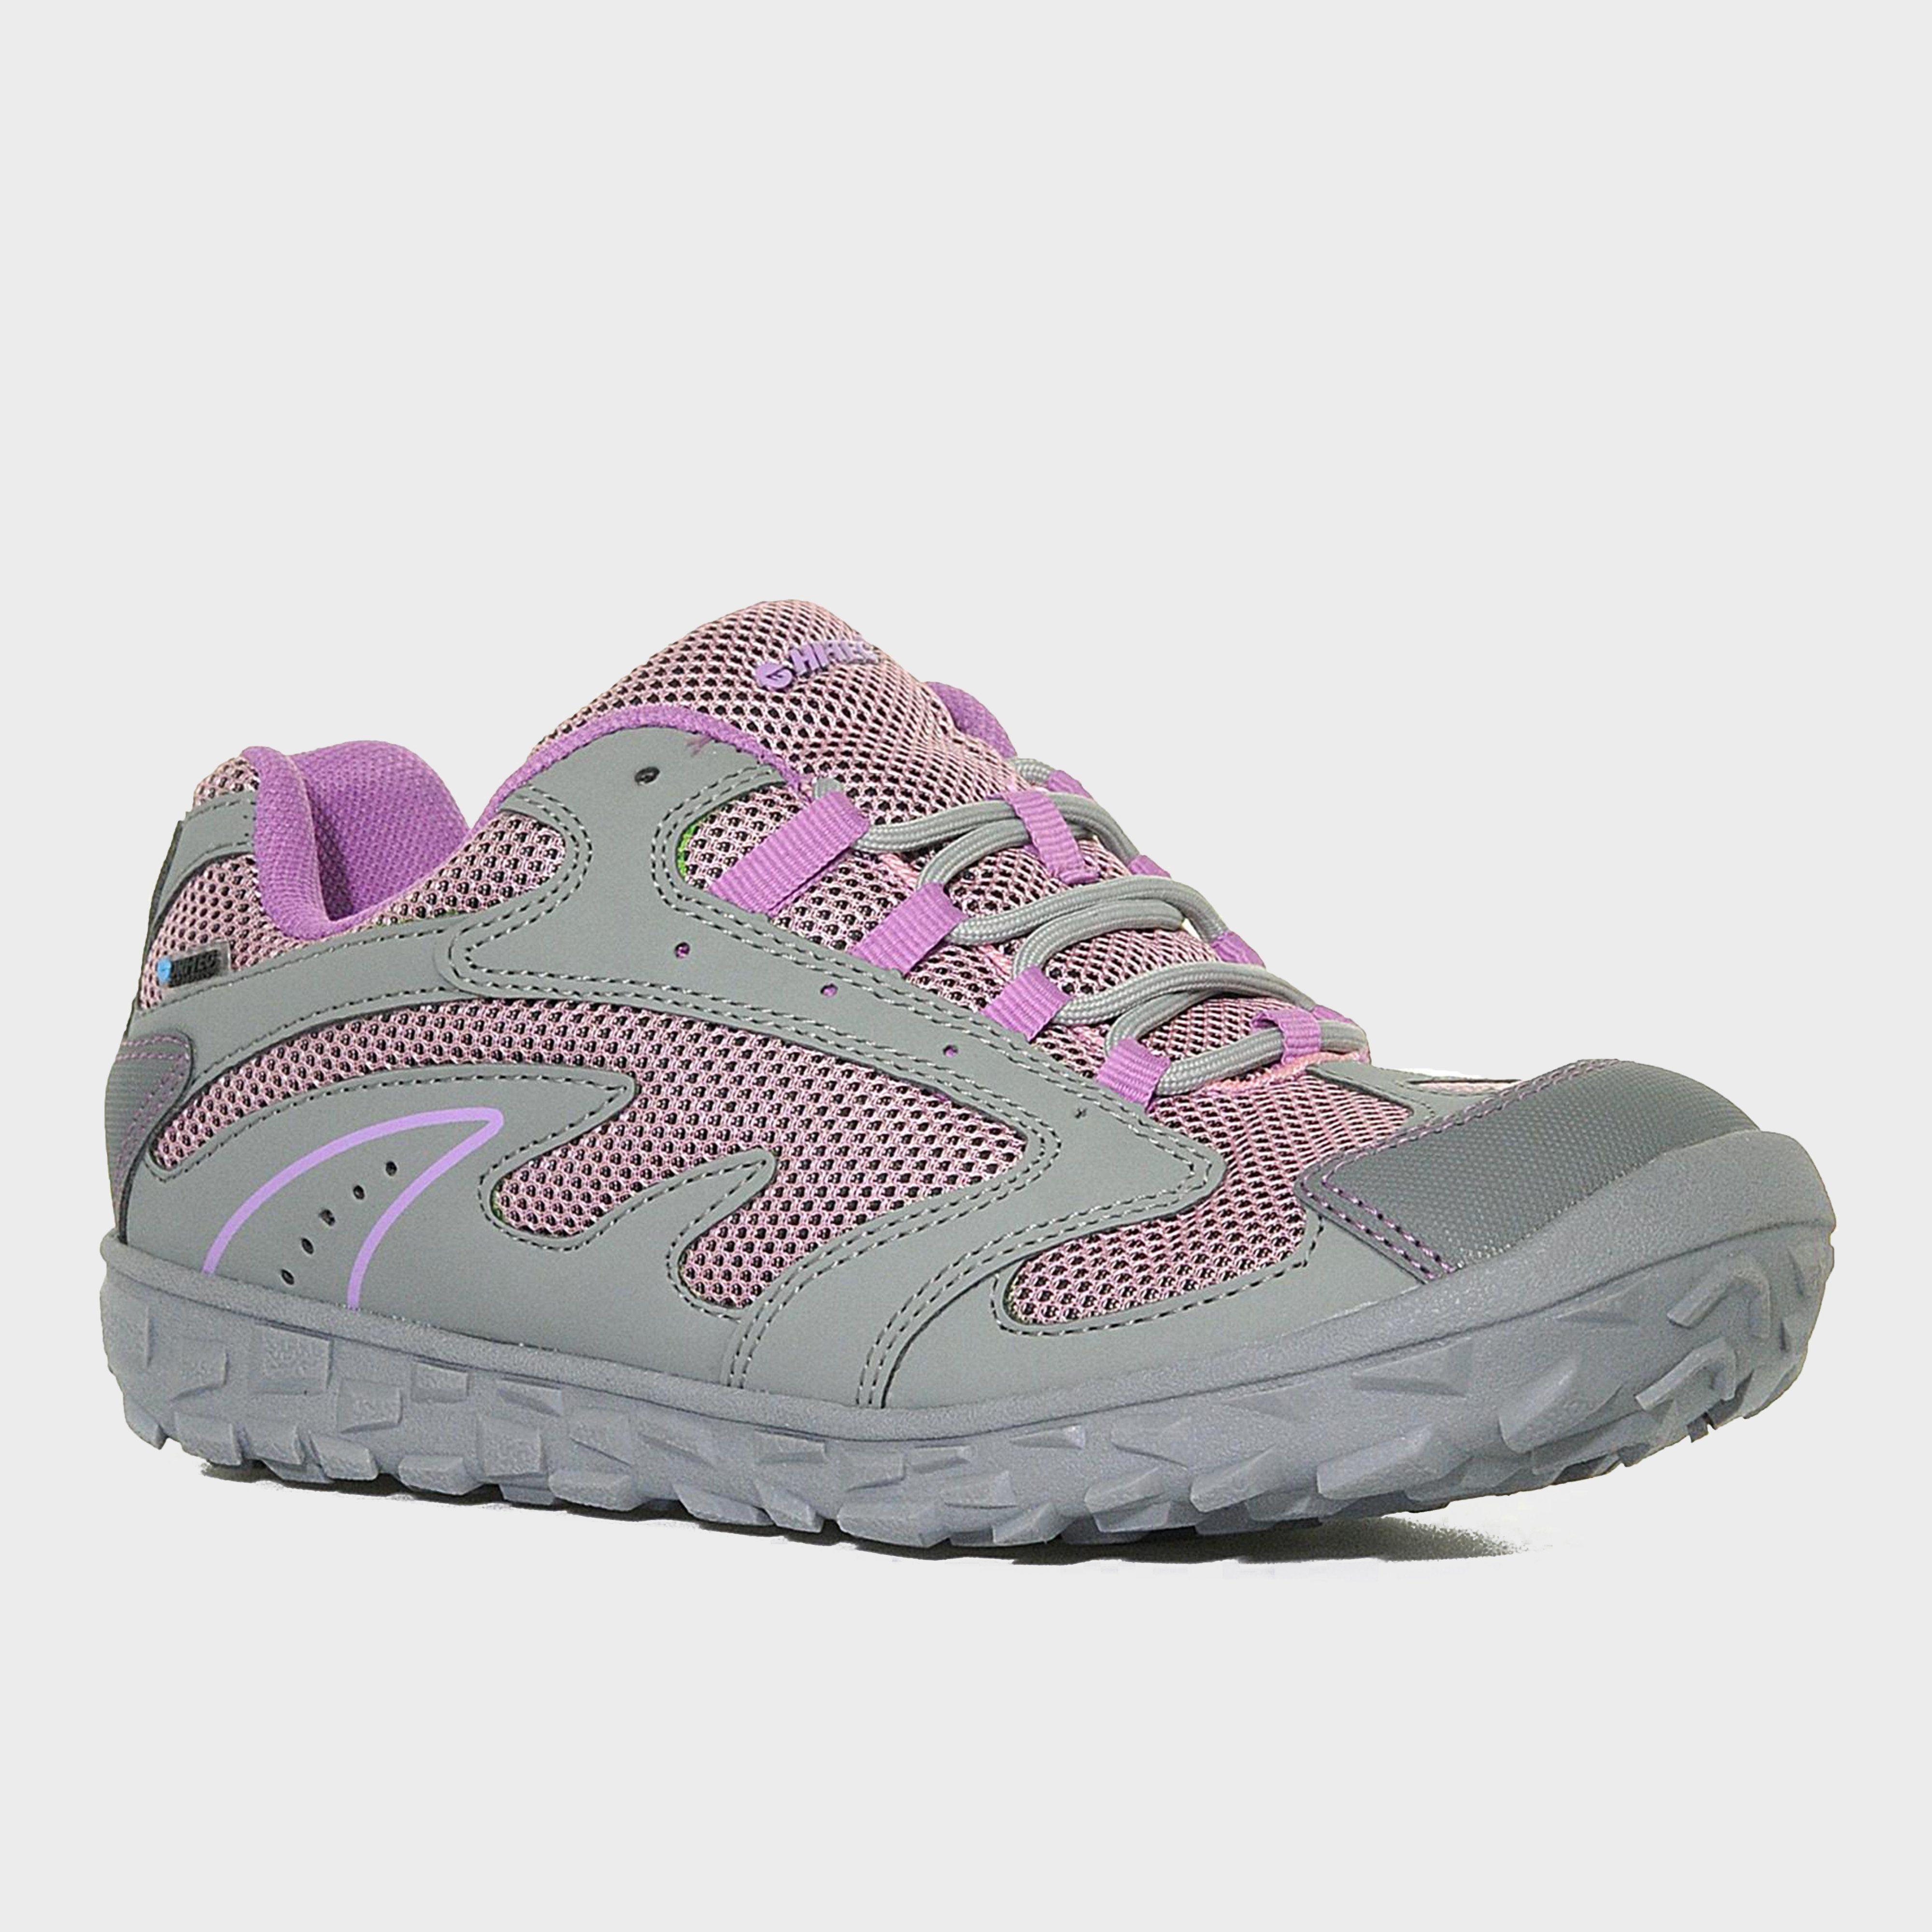 HI TEC Girls' Meridian Low-Cut Waterproof Multi-Sport Shoe